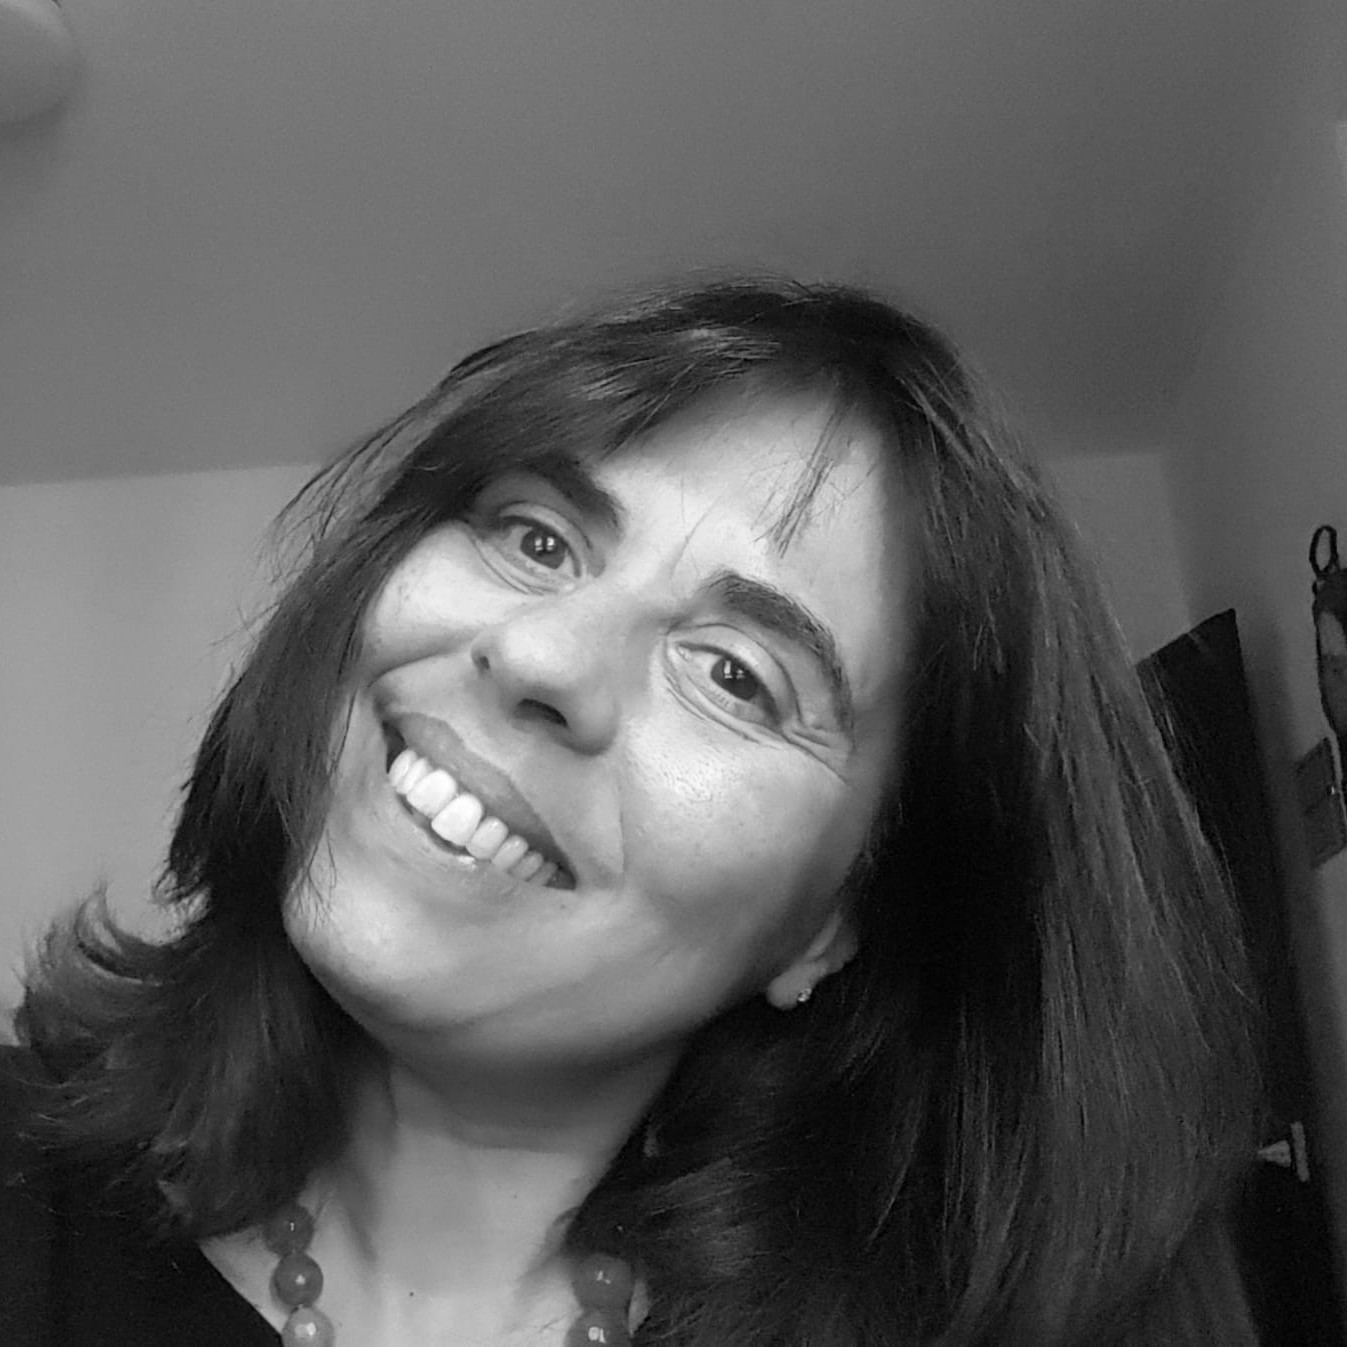 Dott.Ssa Franceschina Garofalo